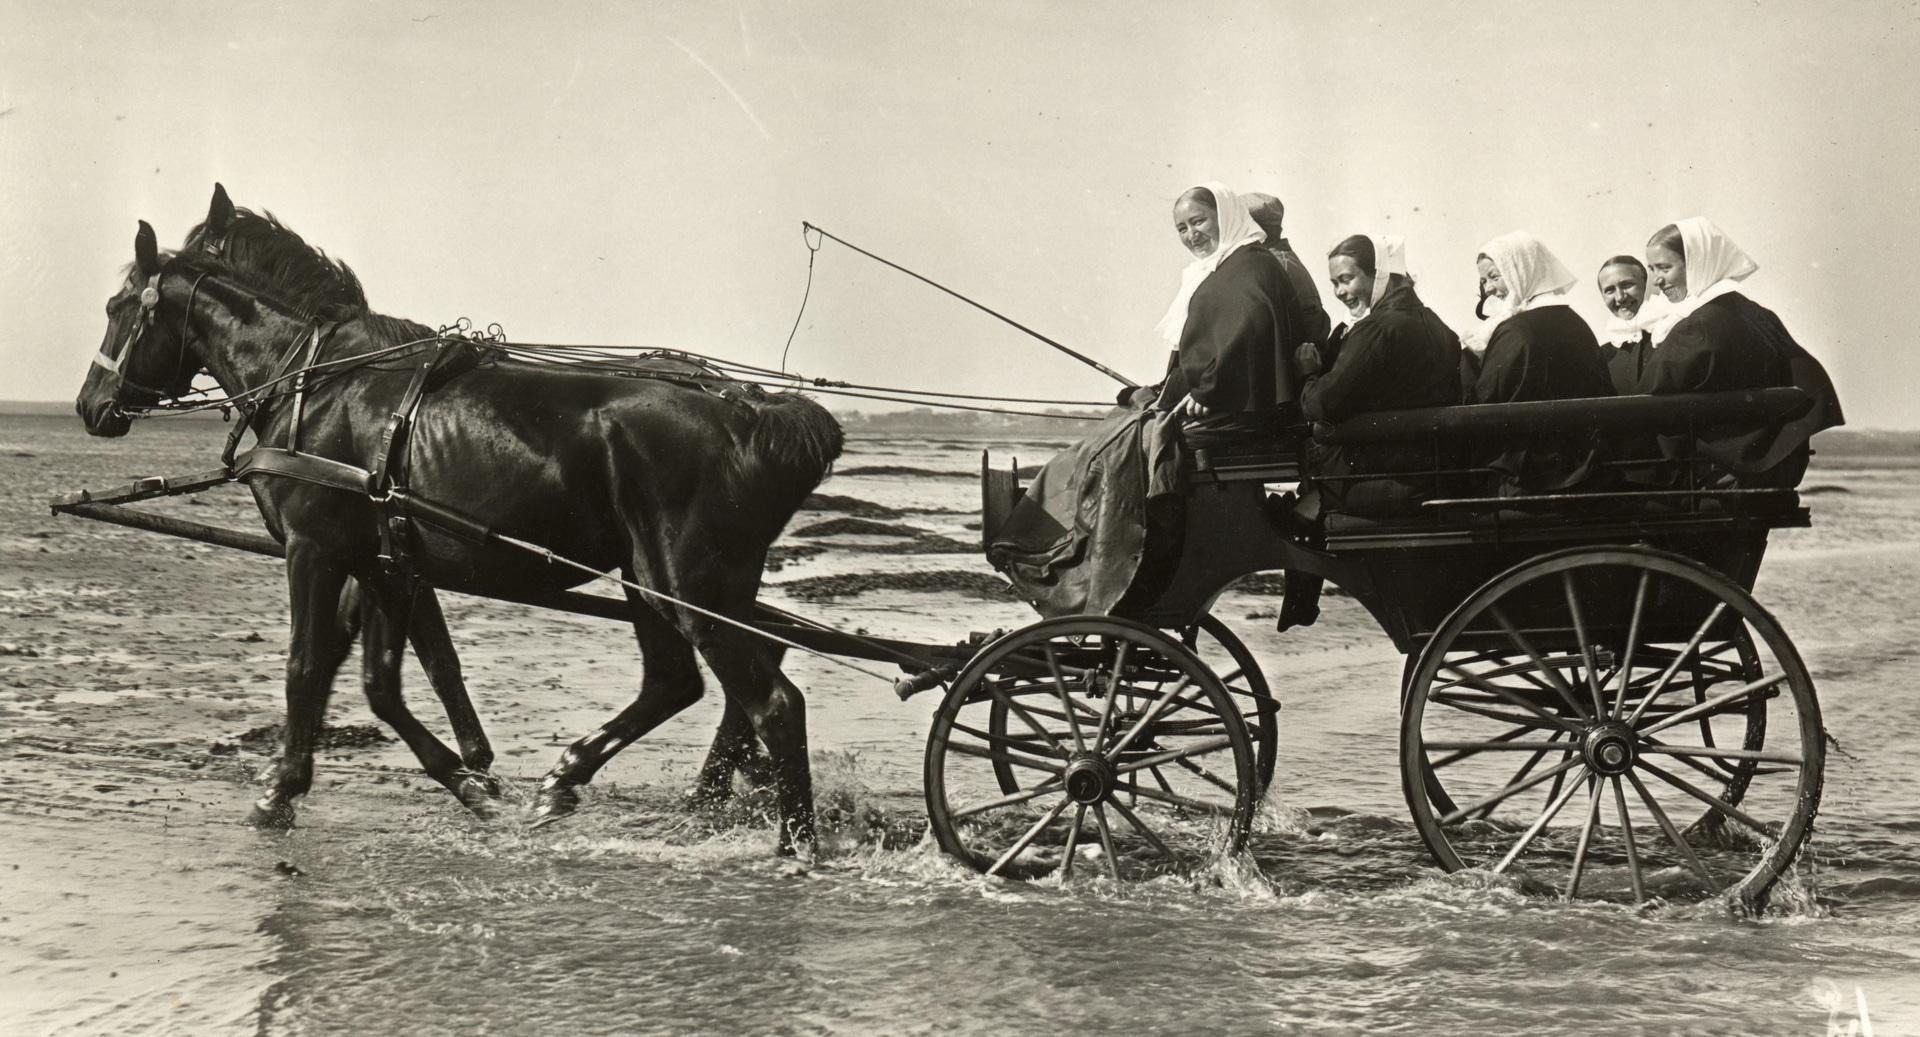 019 Fahrt durchs Wattenmeer 1939.jpg